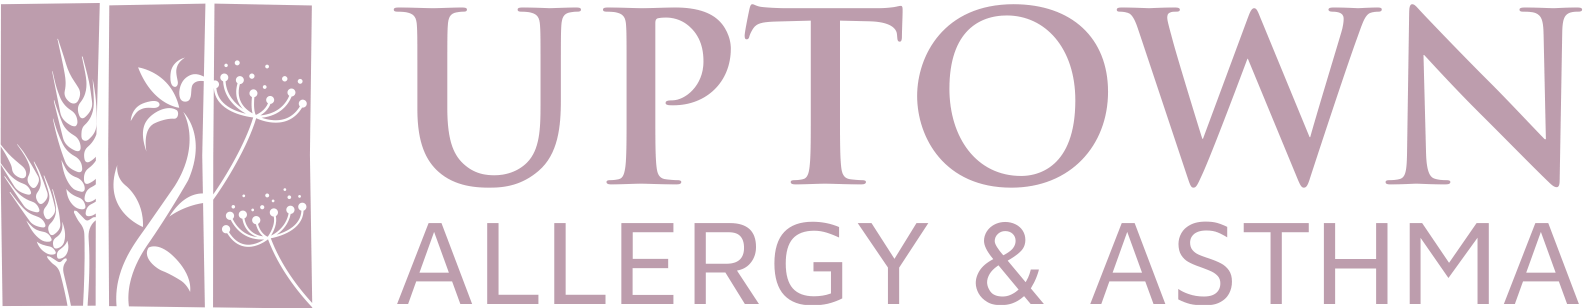 Uptown Allergy & Asthma logo horizontal pink